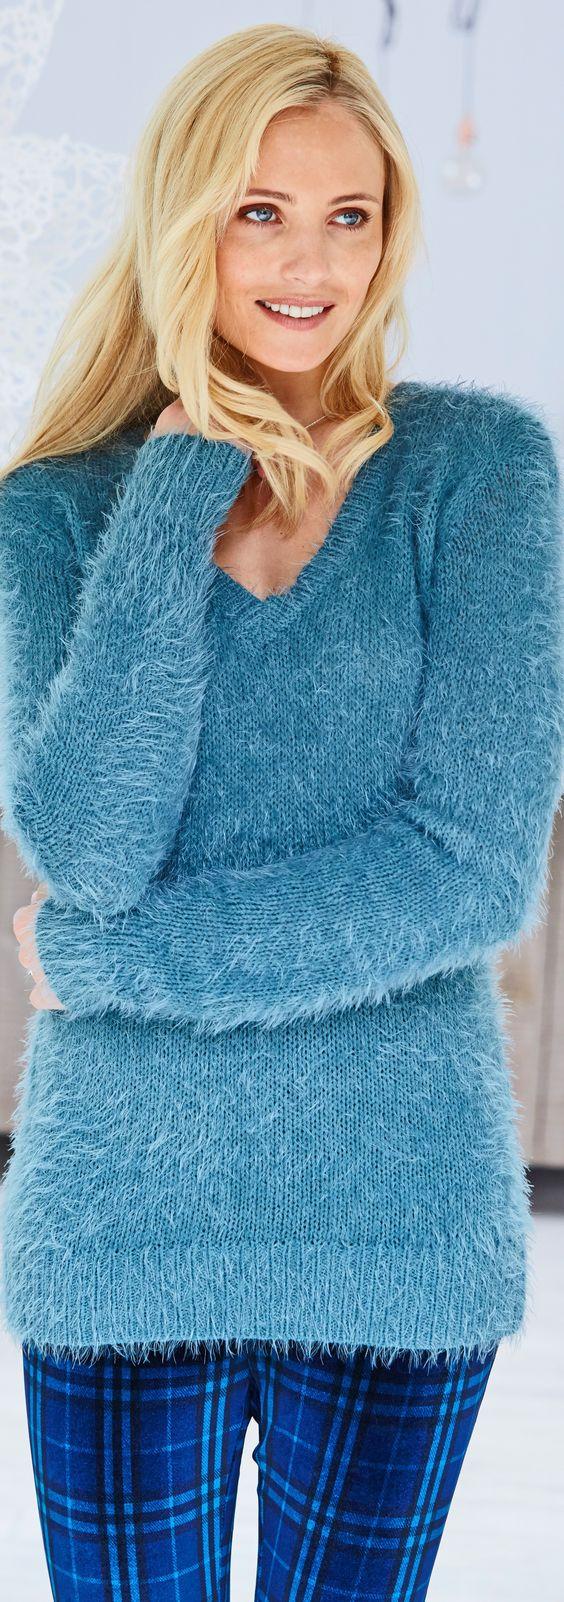 Winter sweaters, Warm and Knitwear on Pinterest